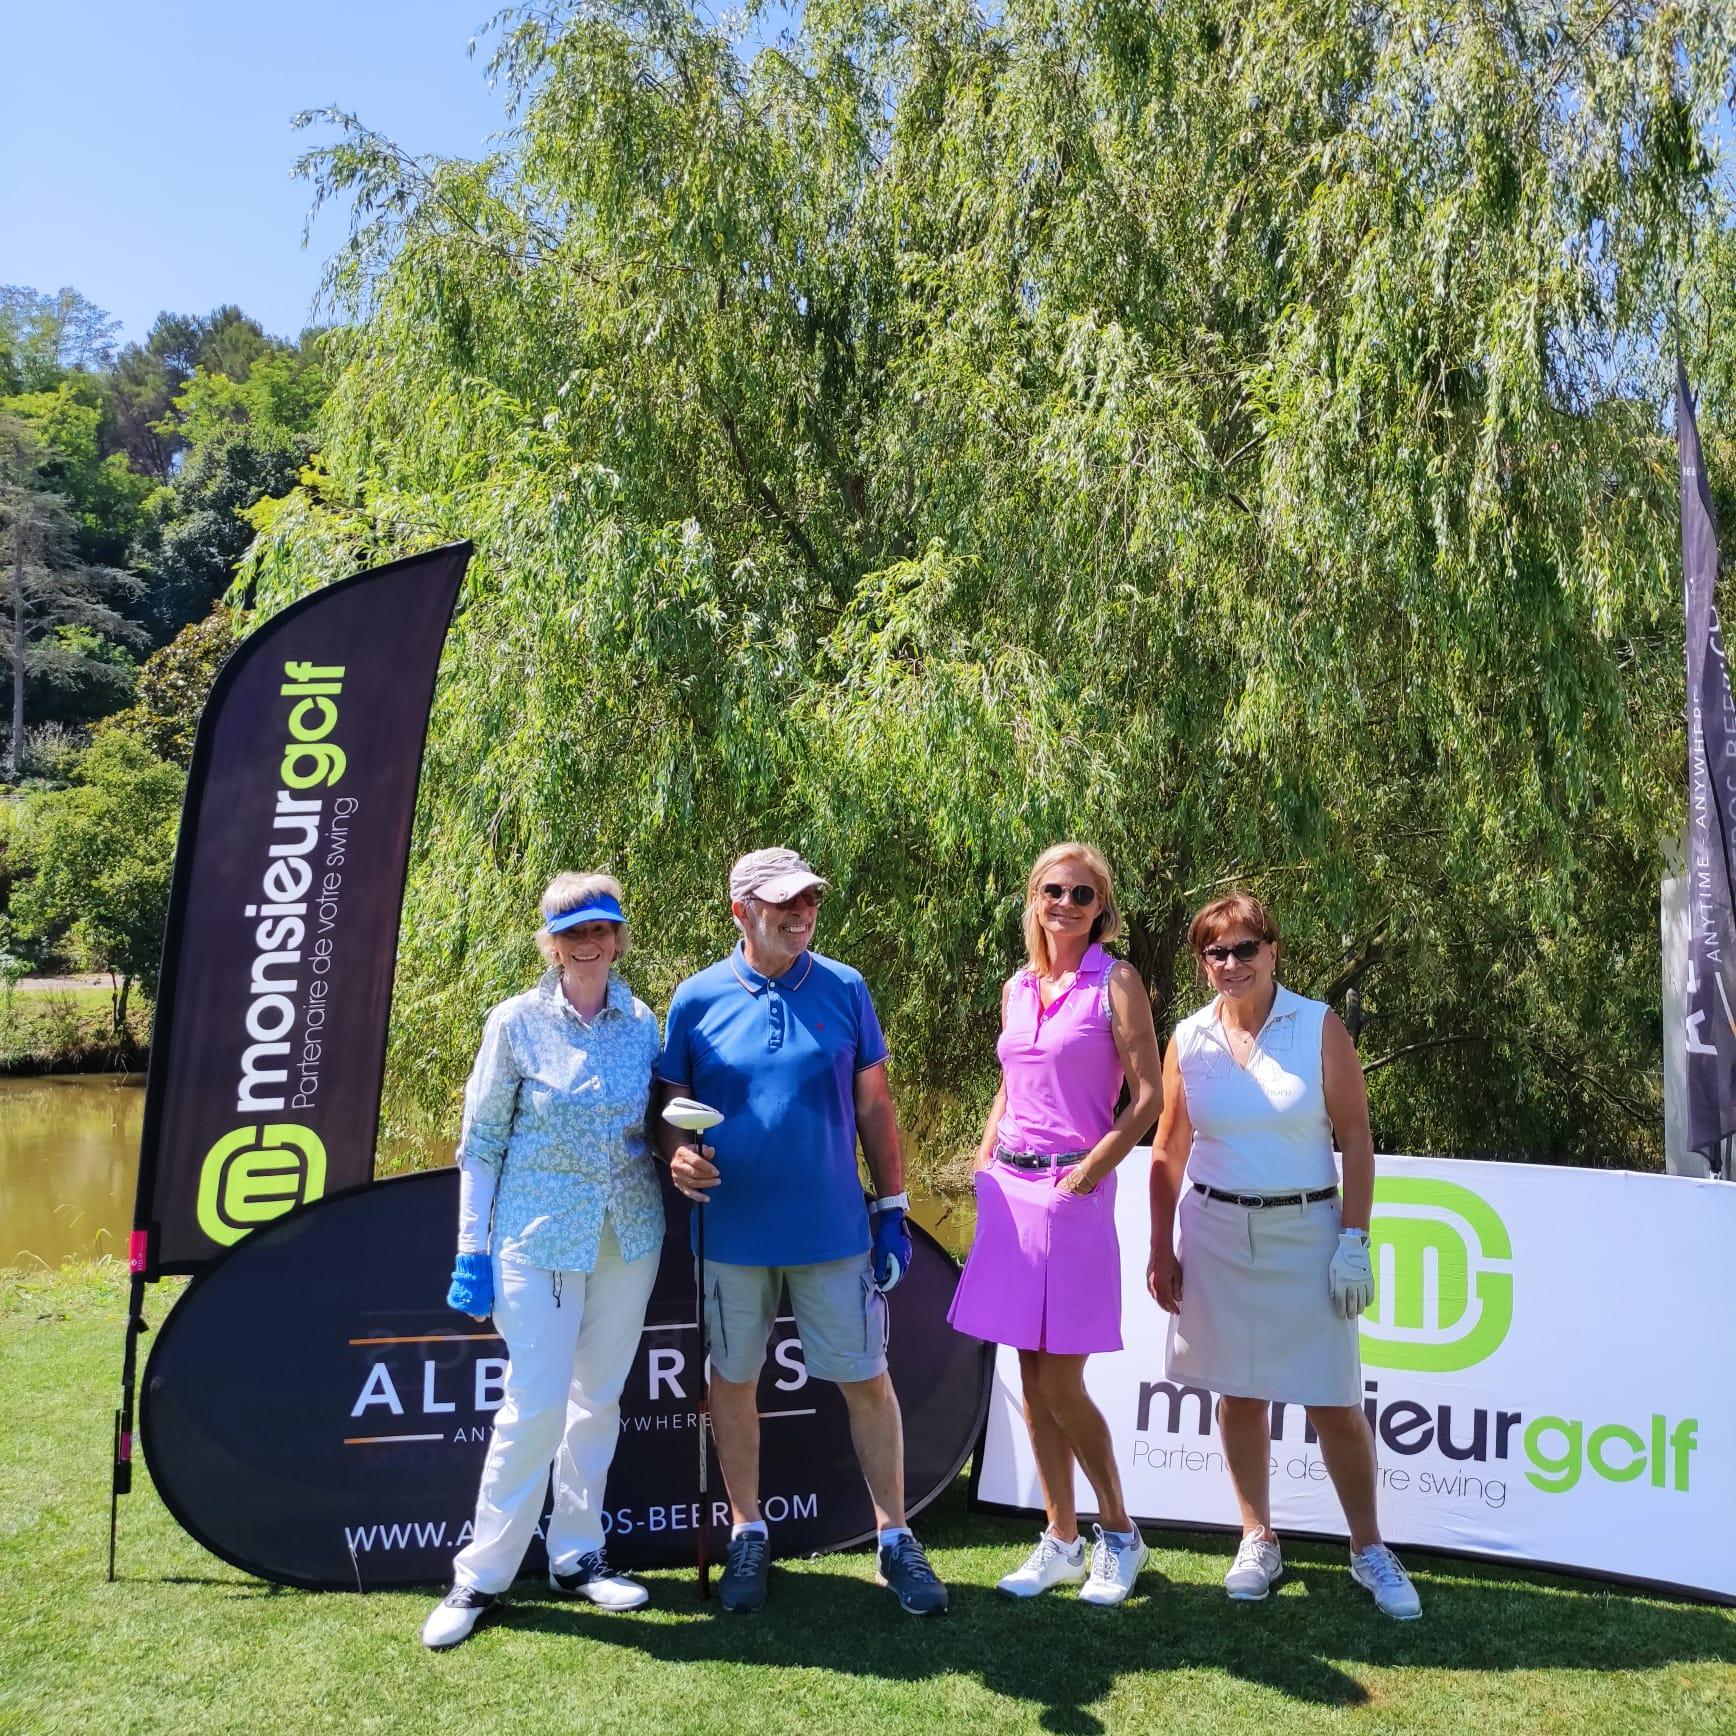 Monsieur Golf Victoria Golf Club 2021 (14)